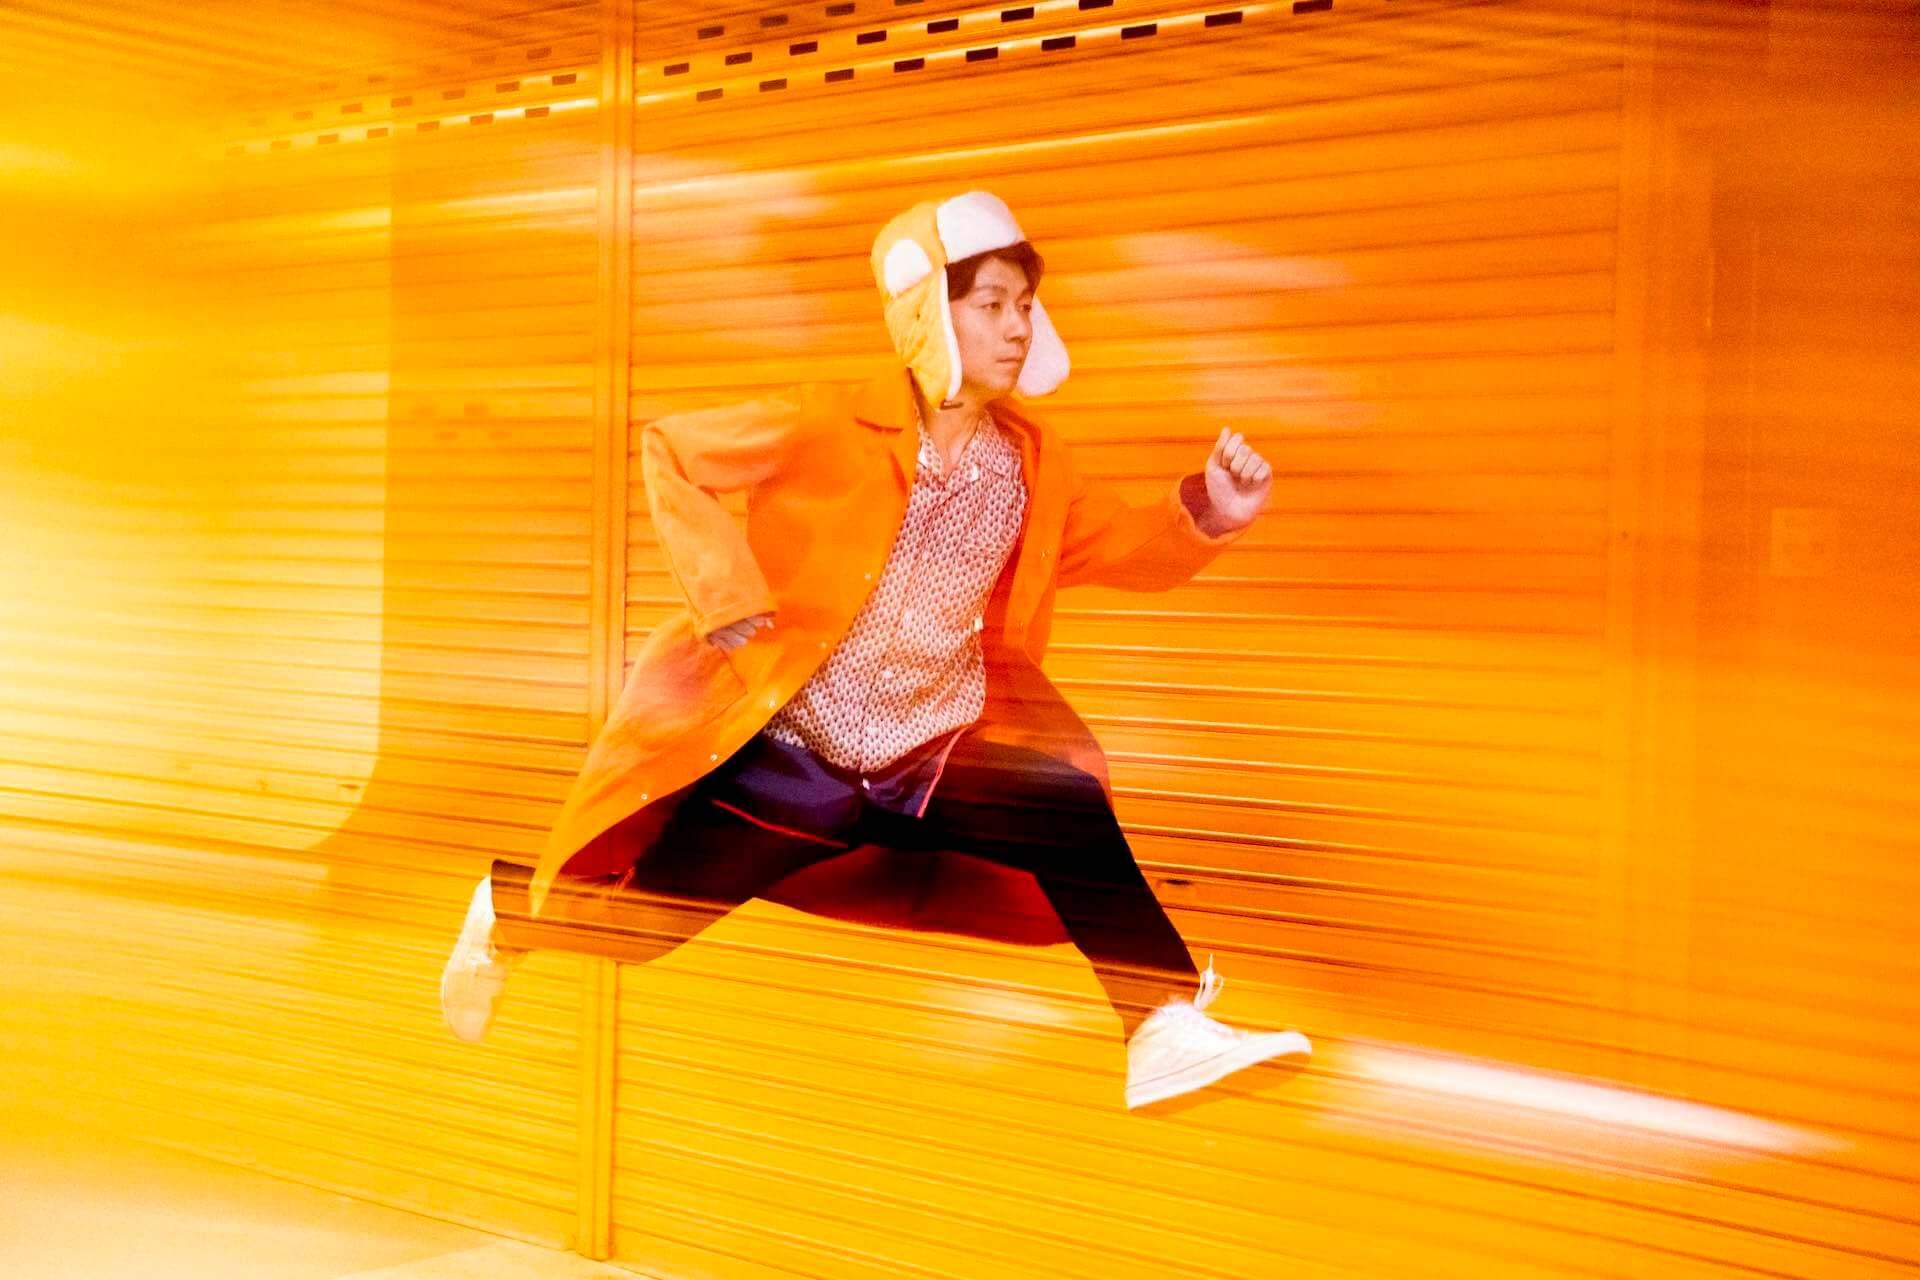 Kenmochi Hidefumiの新曲「Bring Me Joy」が本日デジタルリリース!ソウルフルなフットワークミュージック music200403_kenmochi_hidefumi_release_1-1920x1280